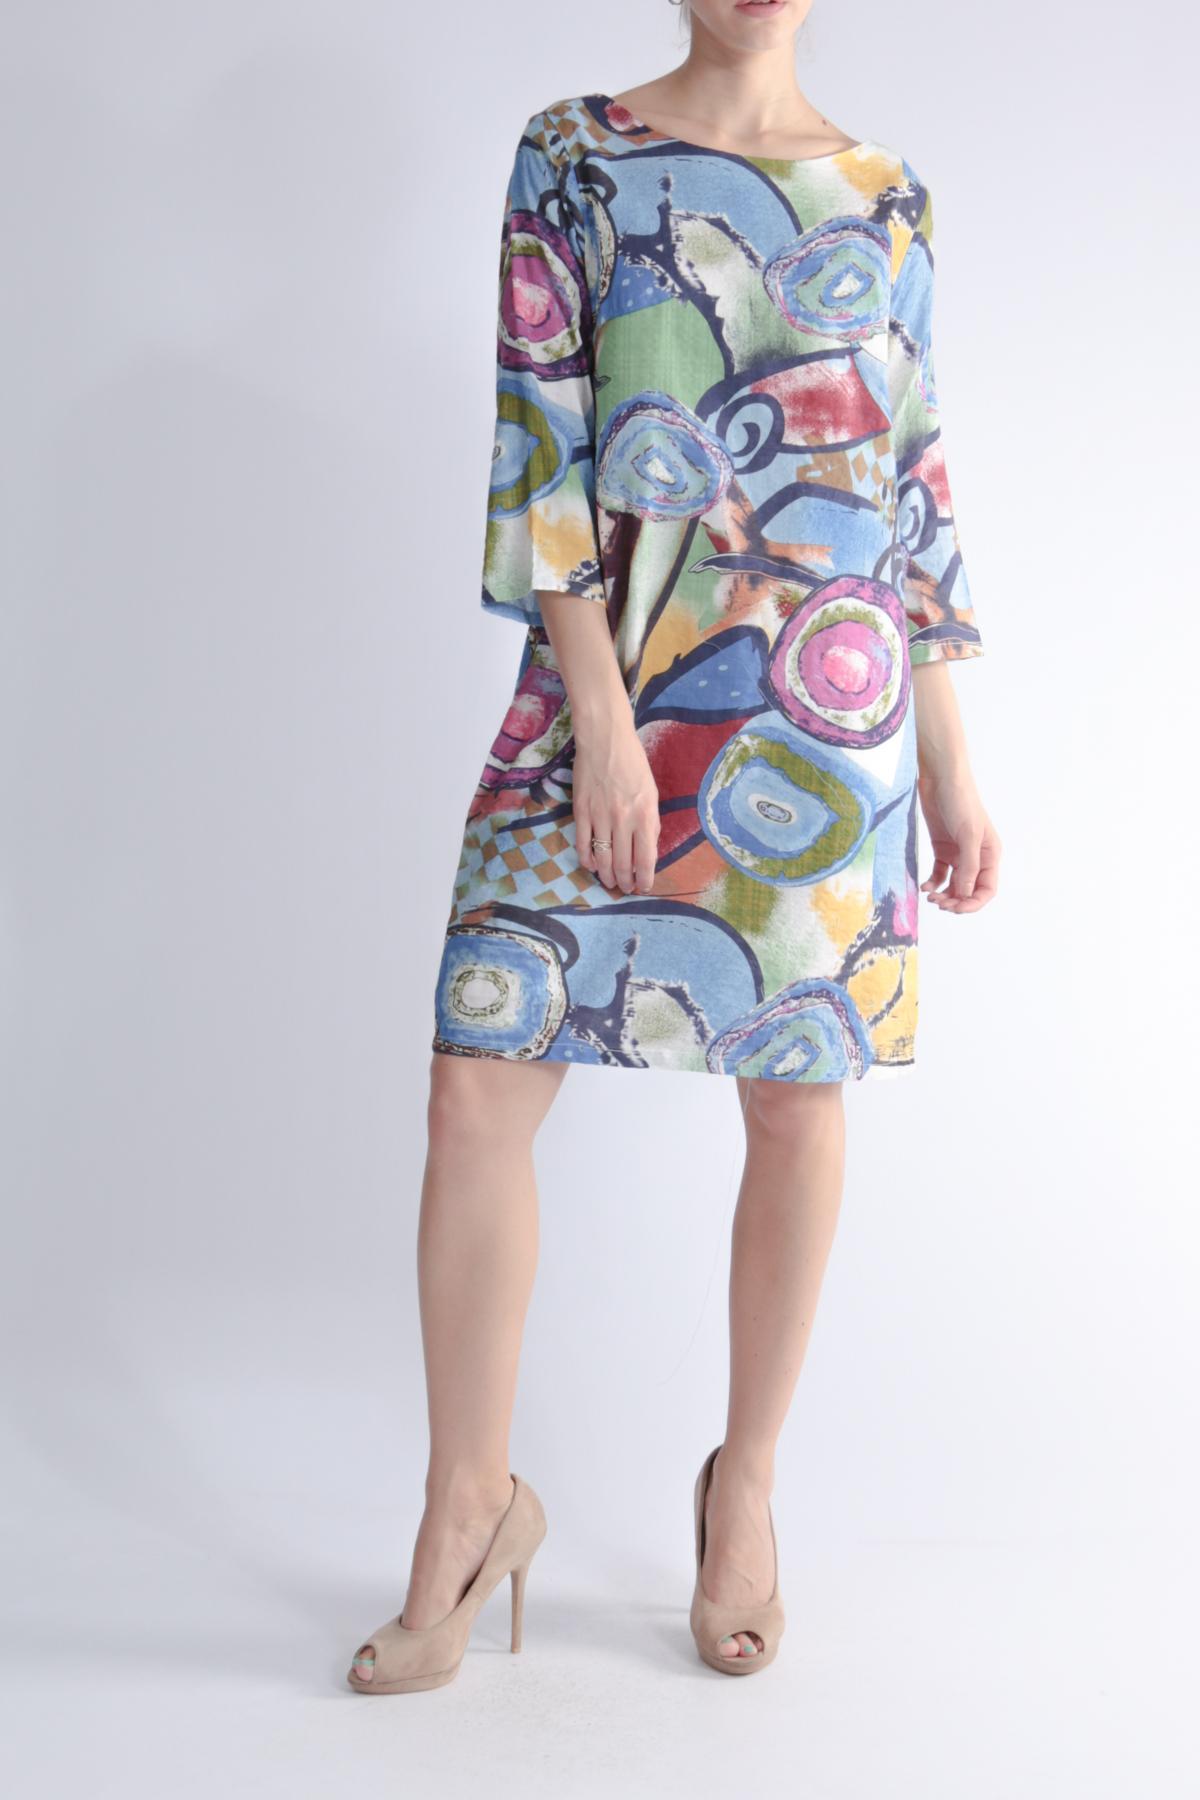 Robes courtes Femme 8620-BLEU For Her Paris (SHINIE)